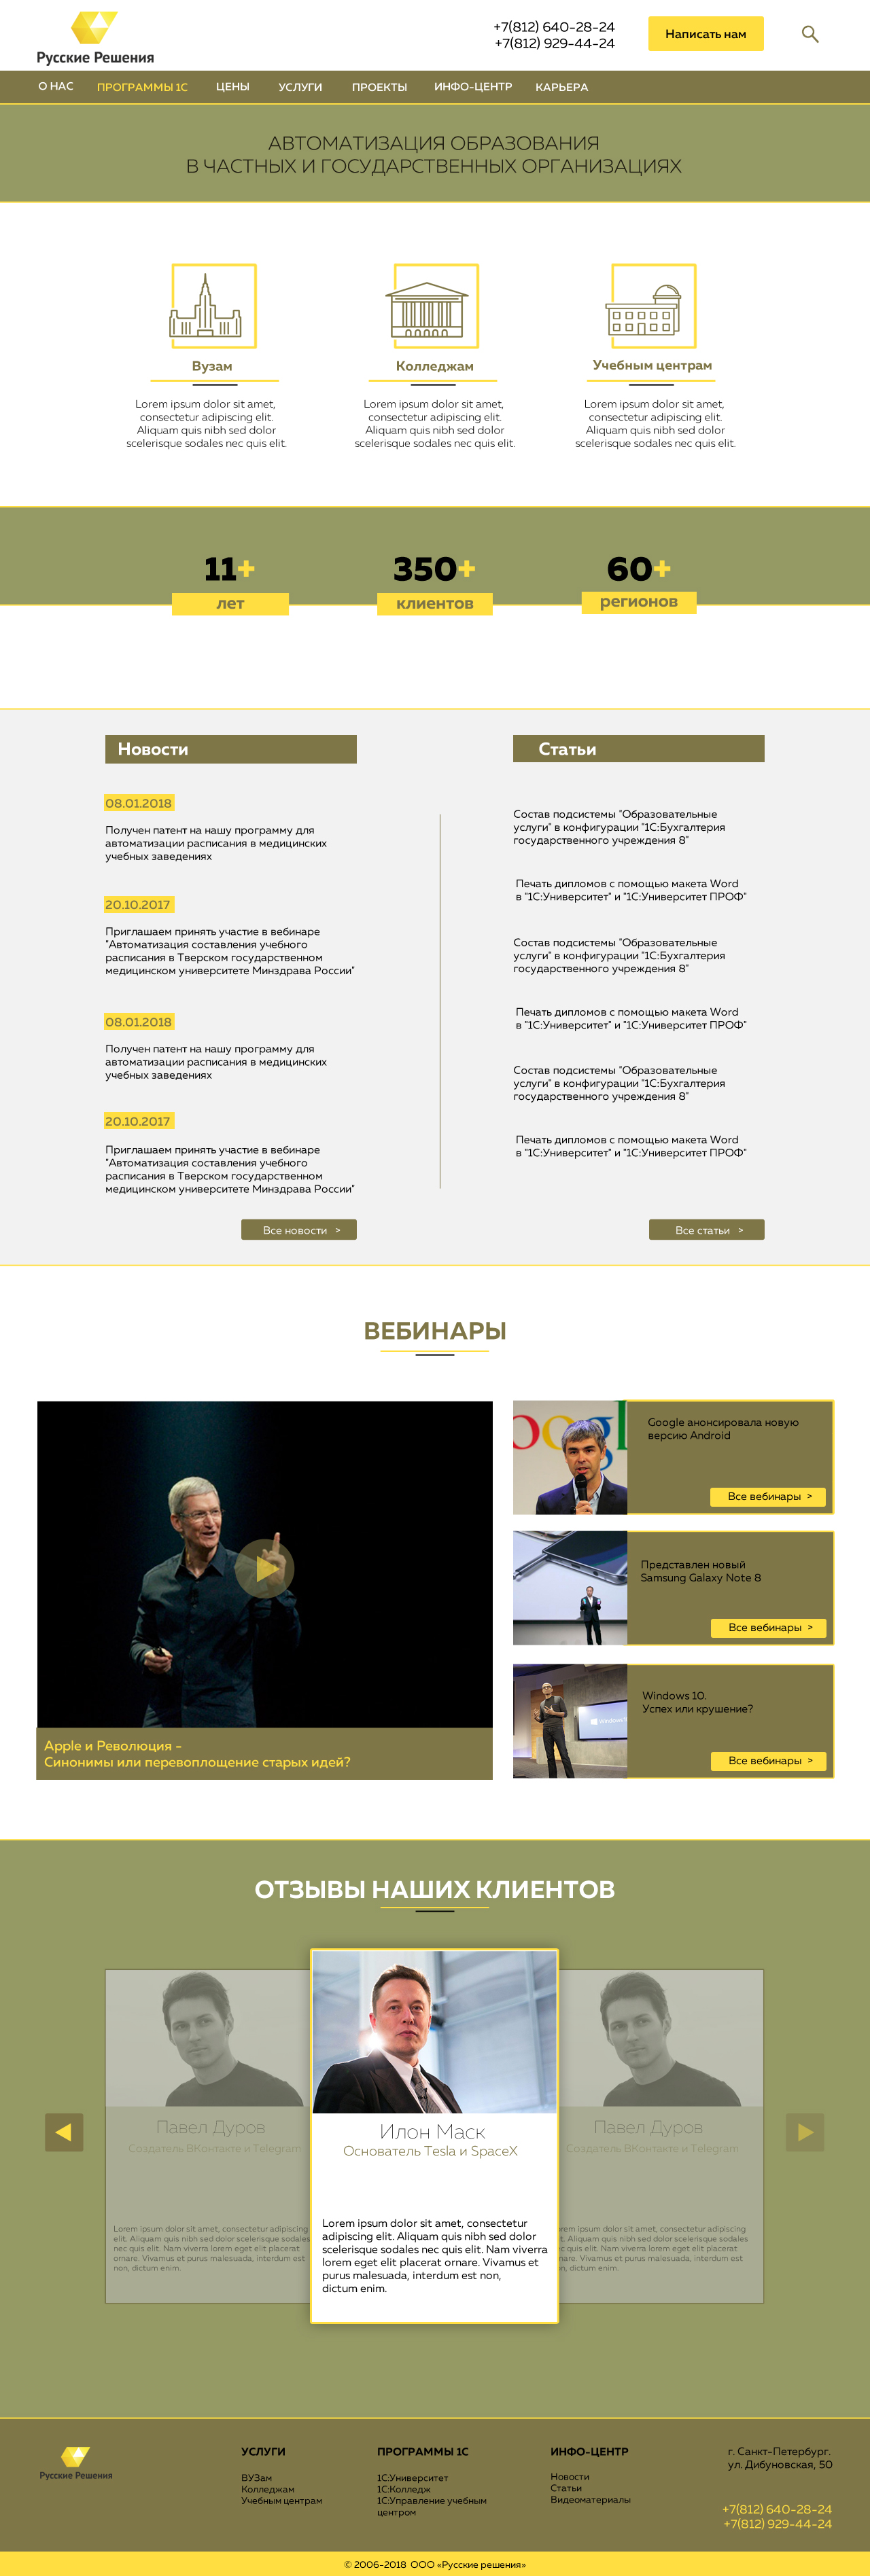 Дизайн главной страницы сайта фото f_2745a61e1b9e525a.jpg